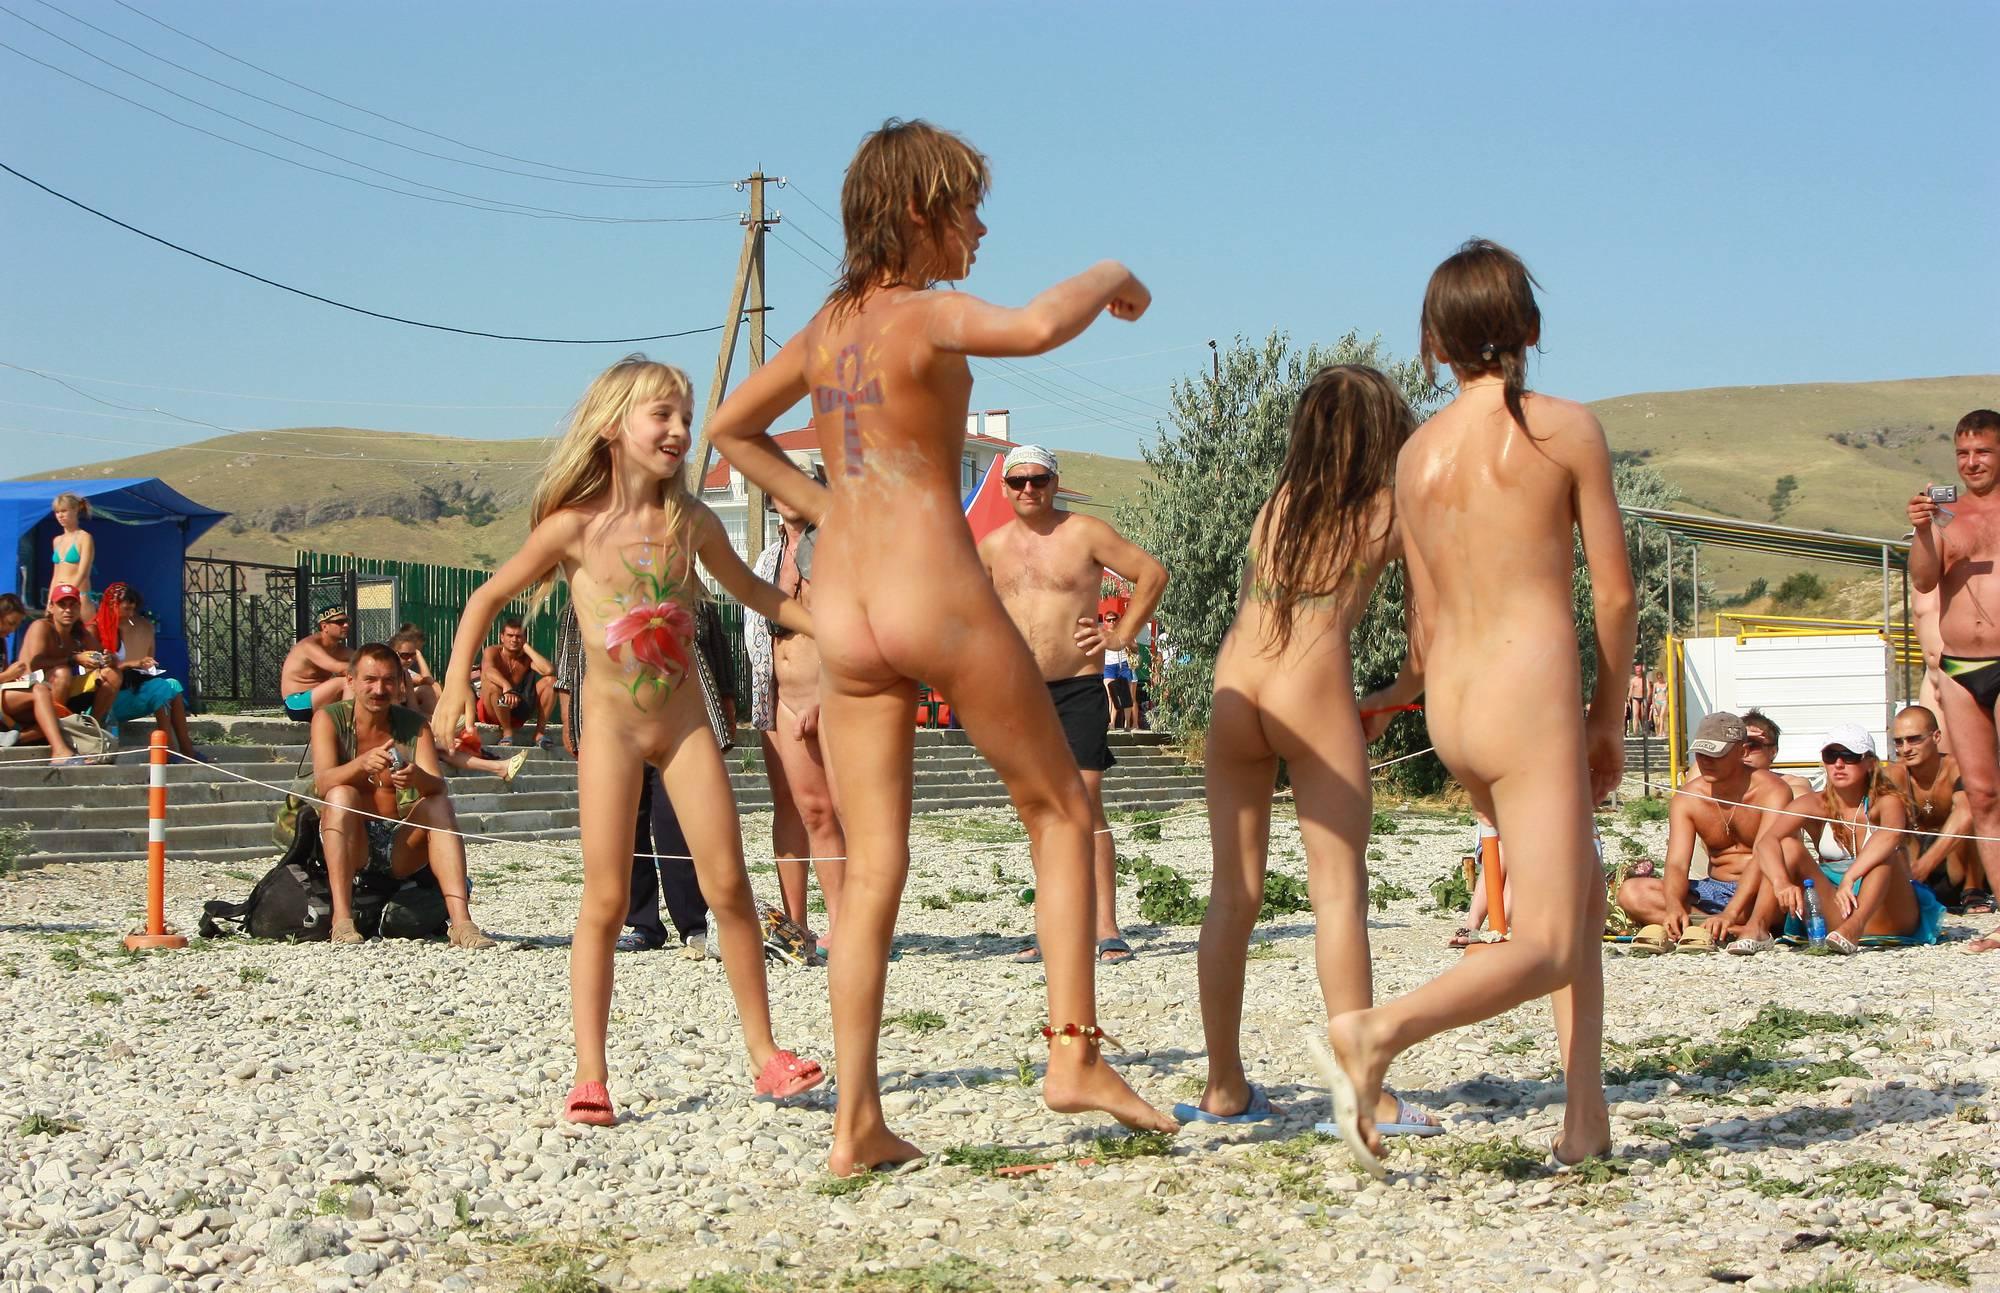 Nudist Photos Ukrainian Dance to the Sky - 2